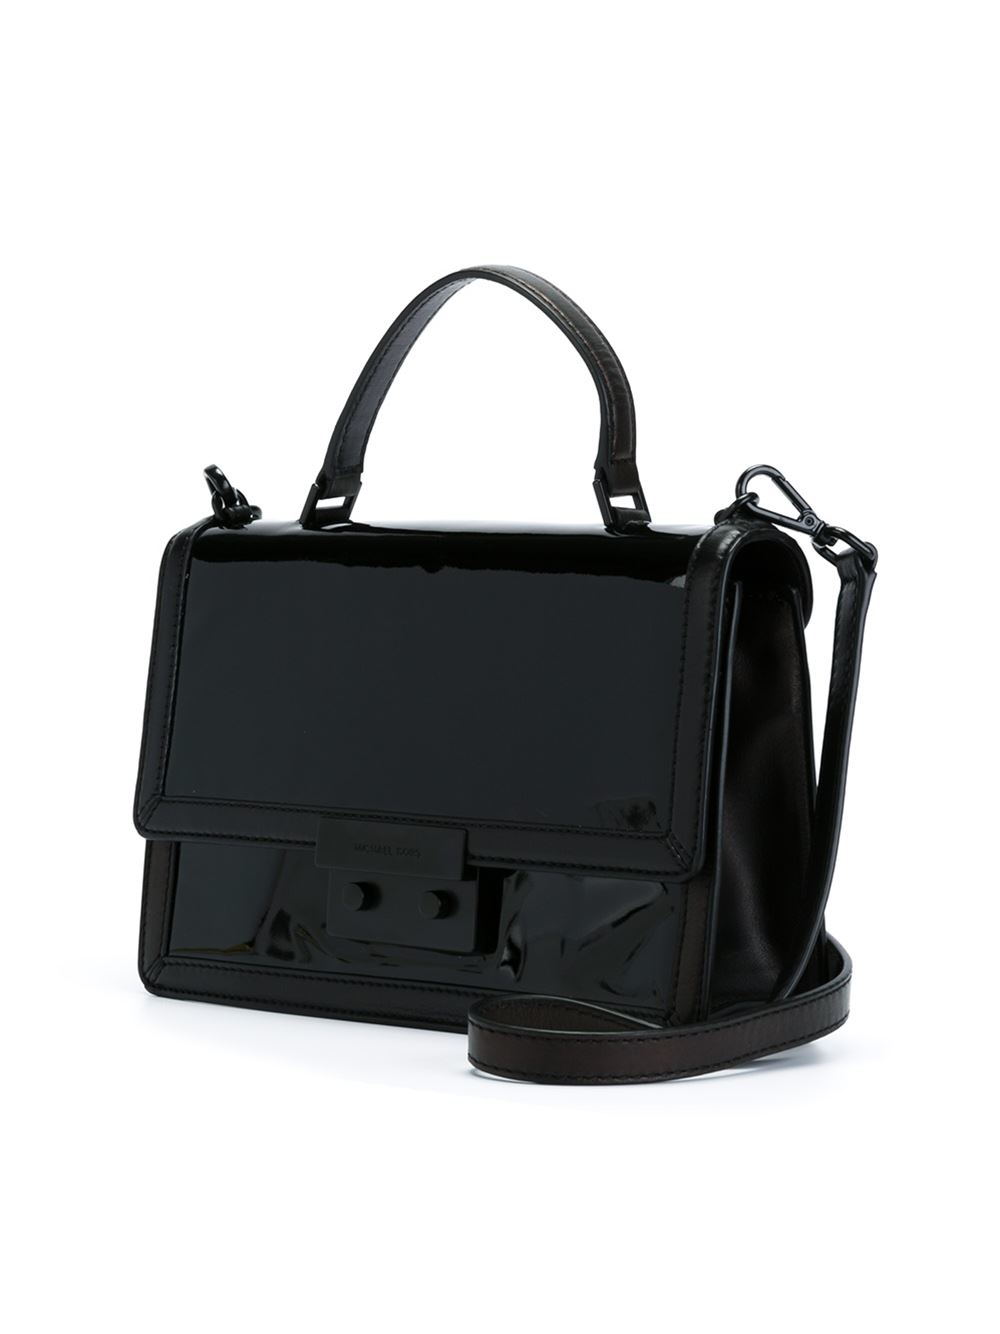 1a1e15e88b69 MICHAEL Michael Kors Callie Patent-Leather Cross-Body Bag in Black ...